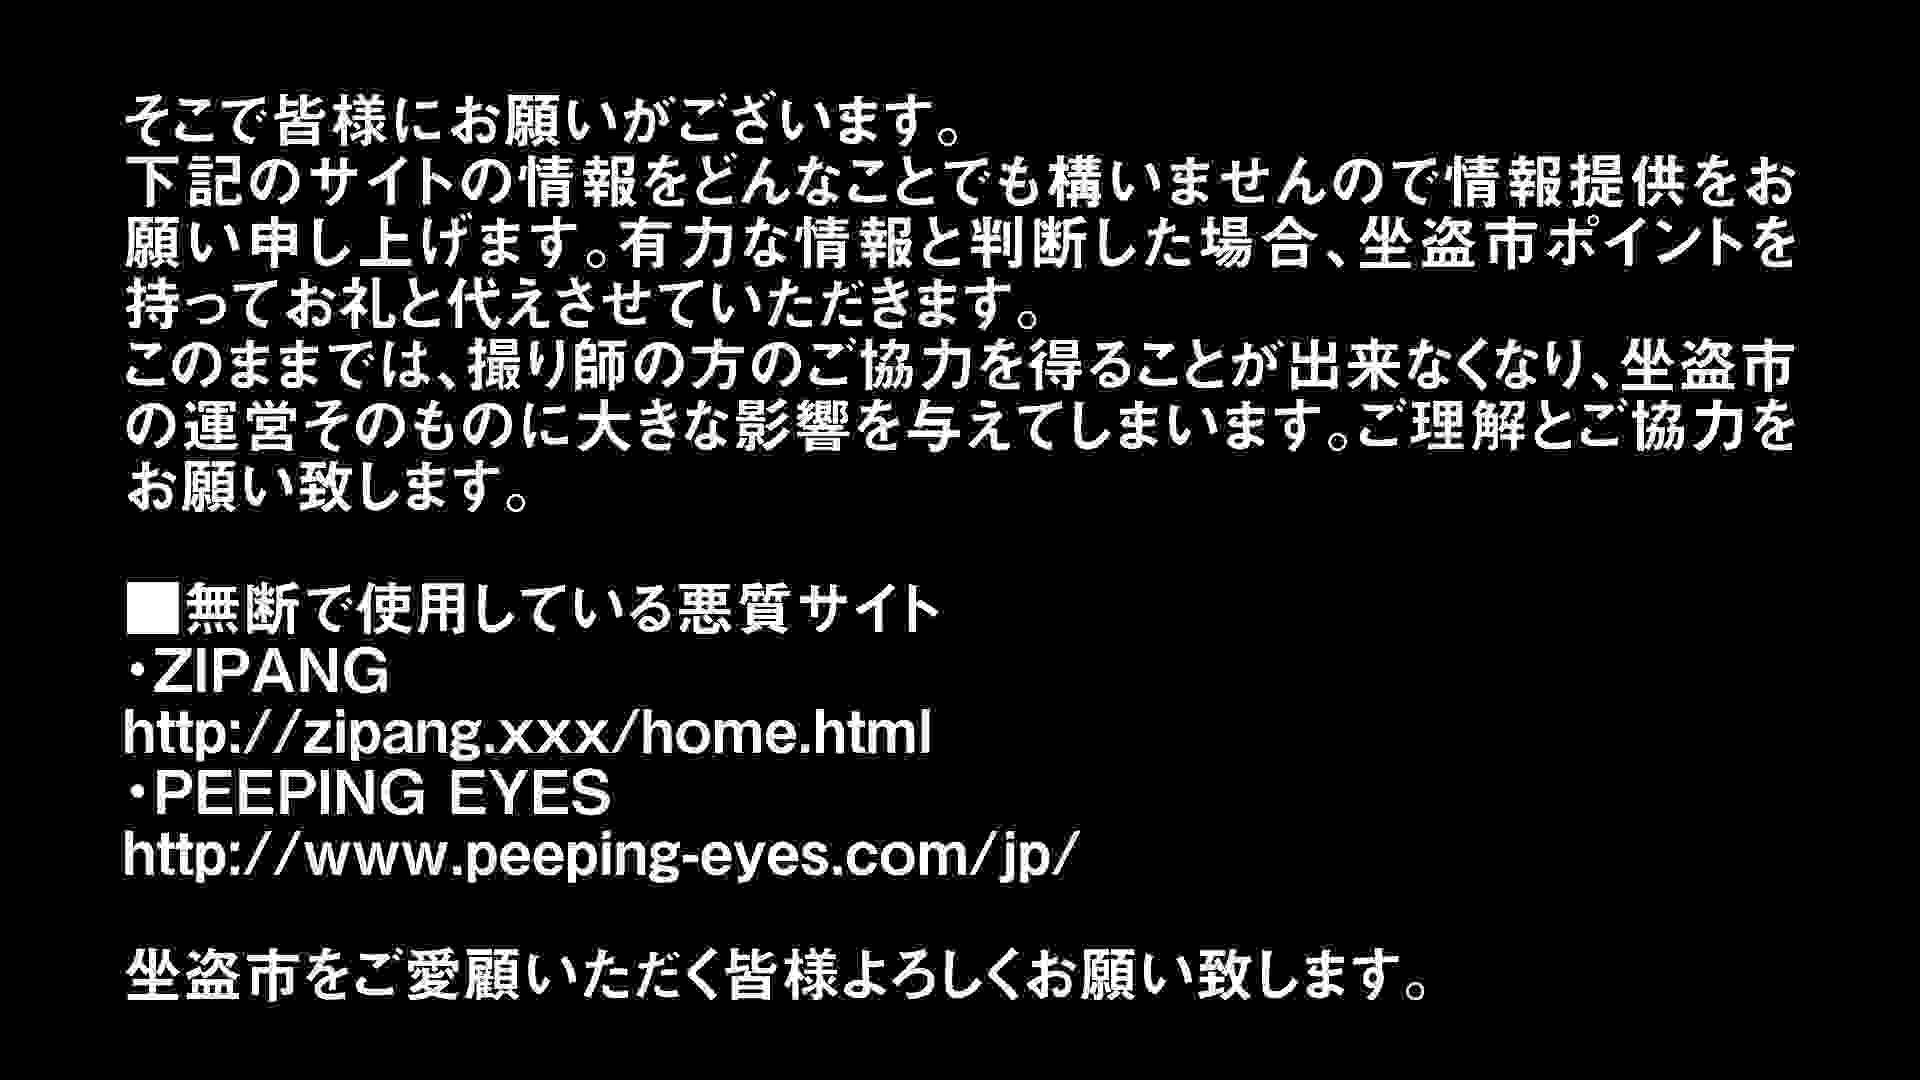 Aquaな露天風呂Vol.304 露天風呂 エロ画像 46連発 2